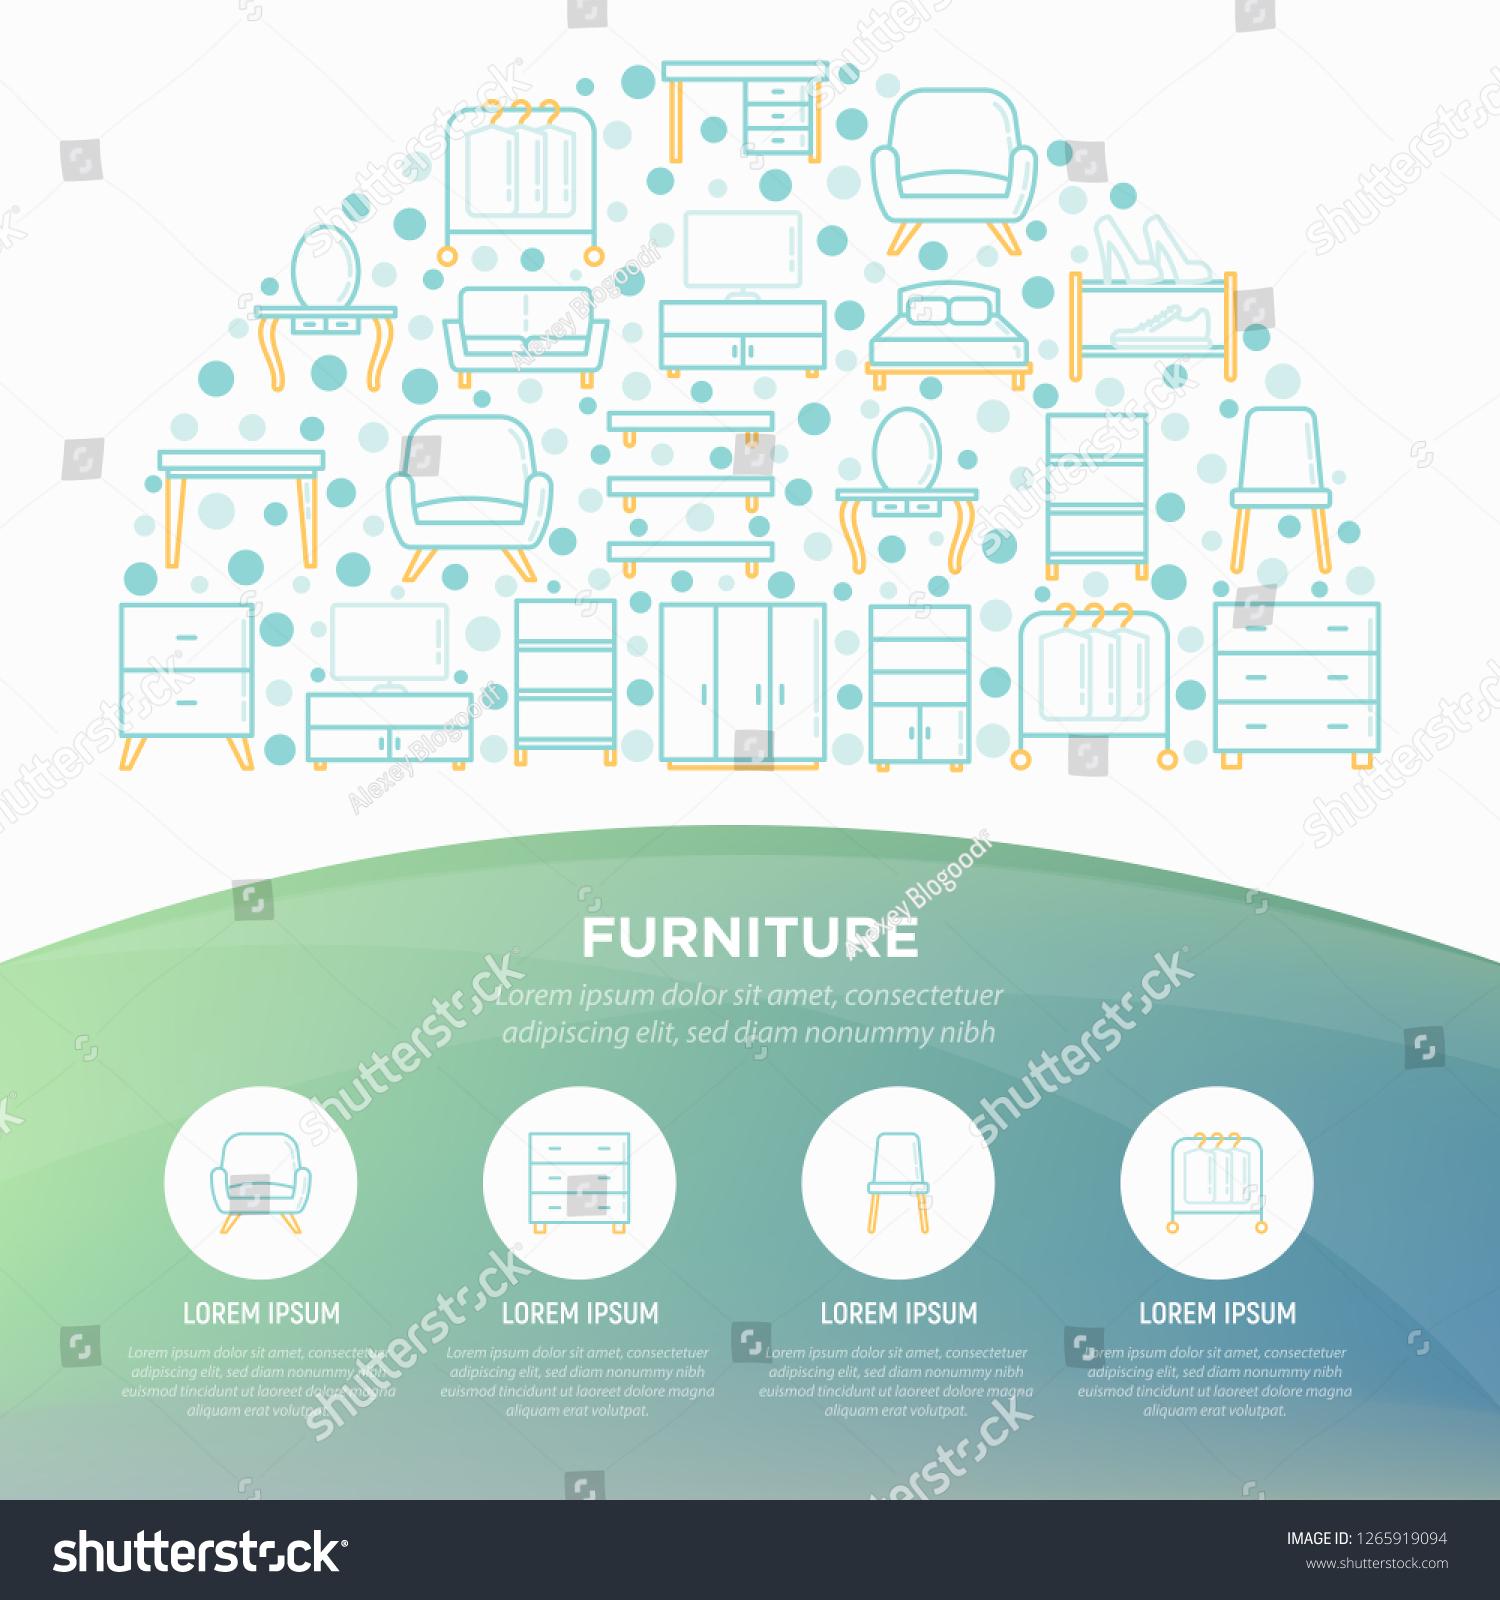 Furniture Concept Half Circle Thin Line Stock Vector